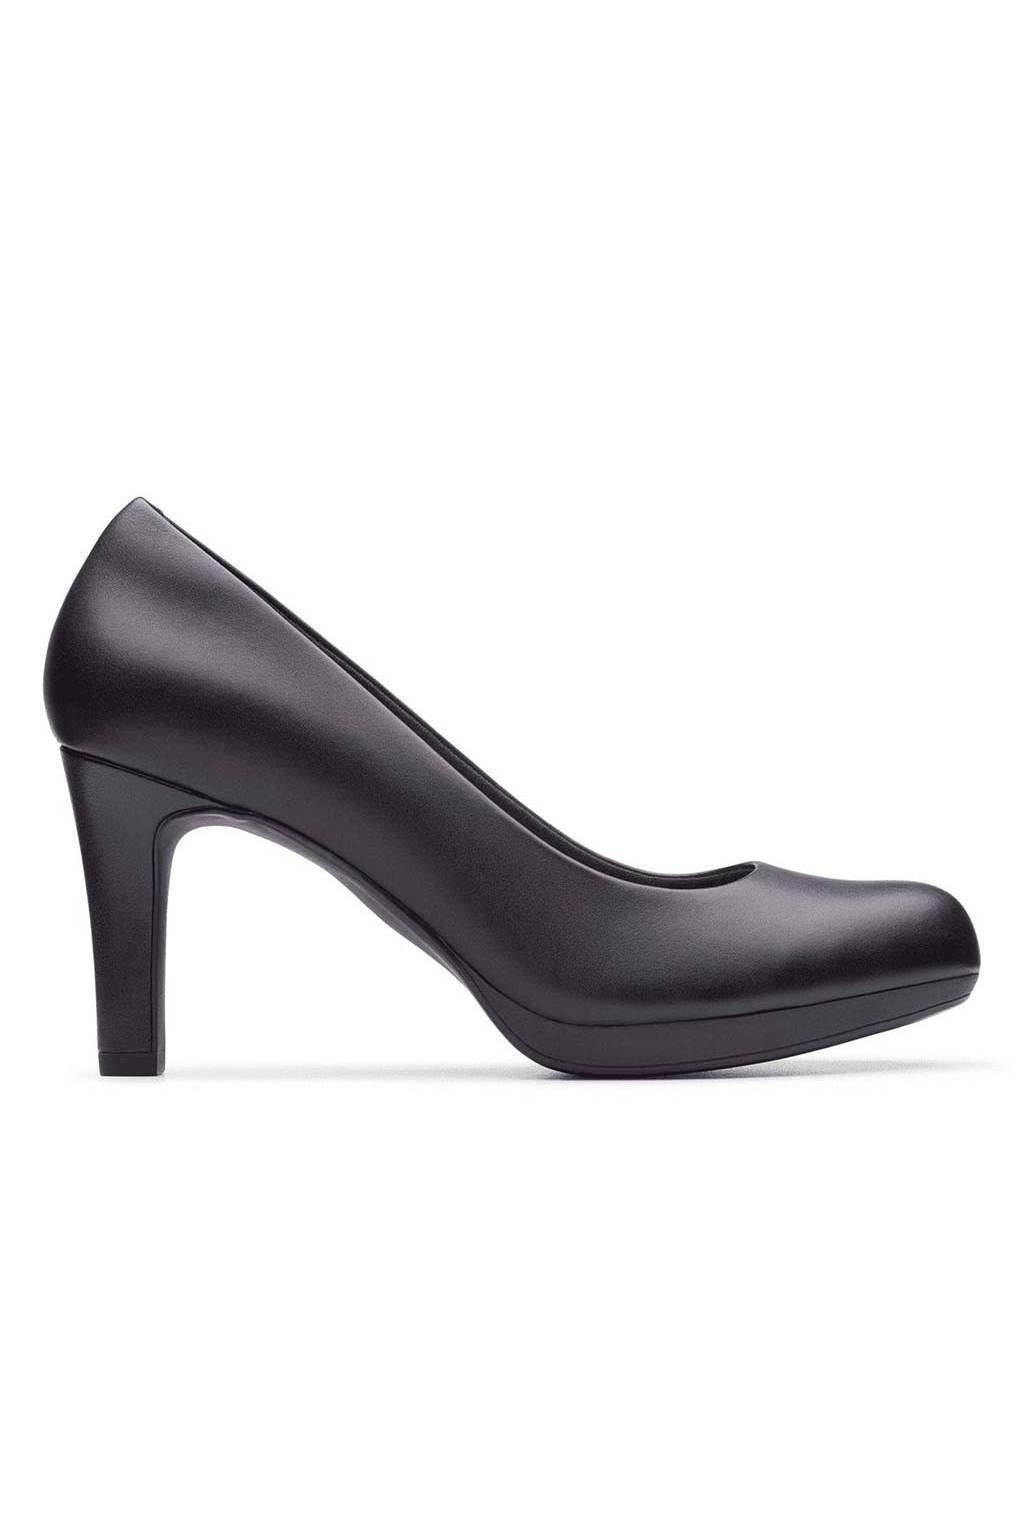 Clarks Adriel Viola Black Leather